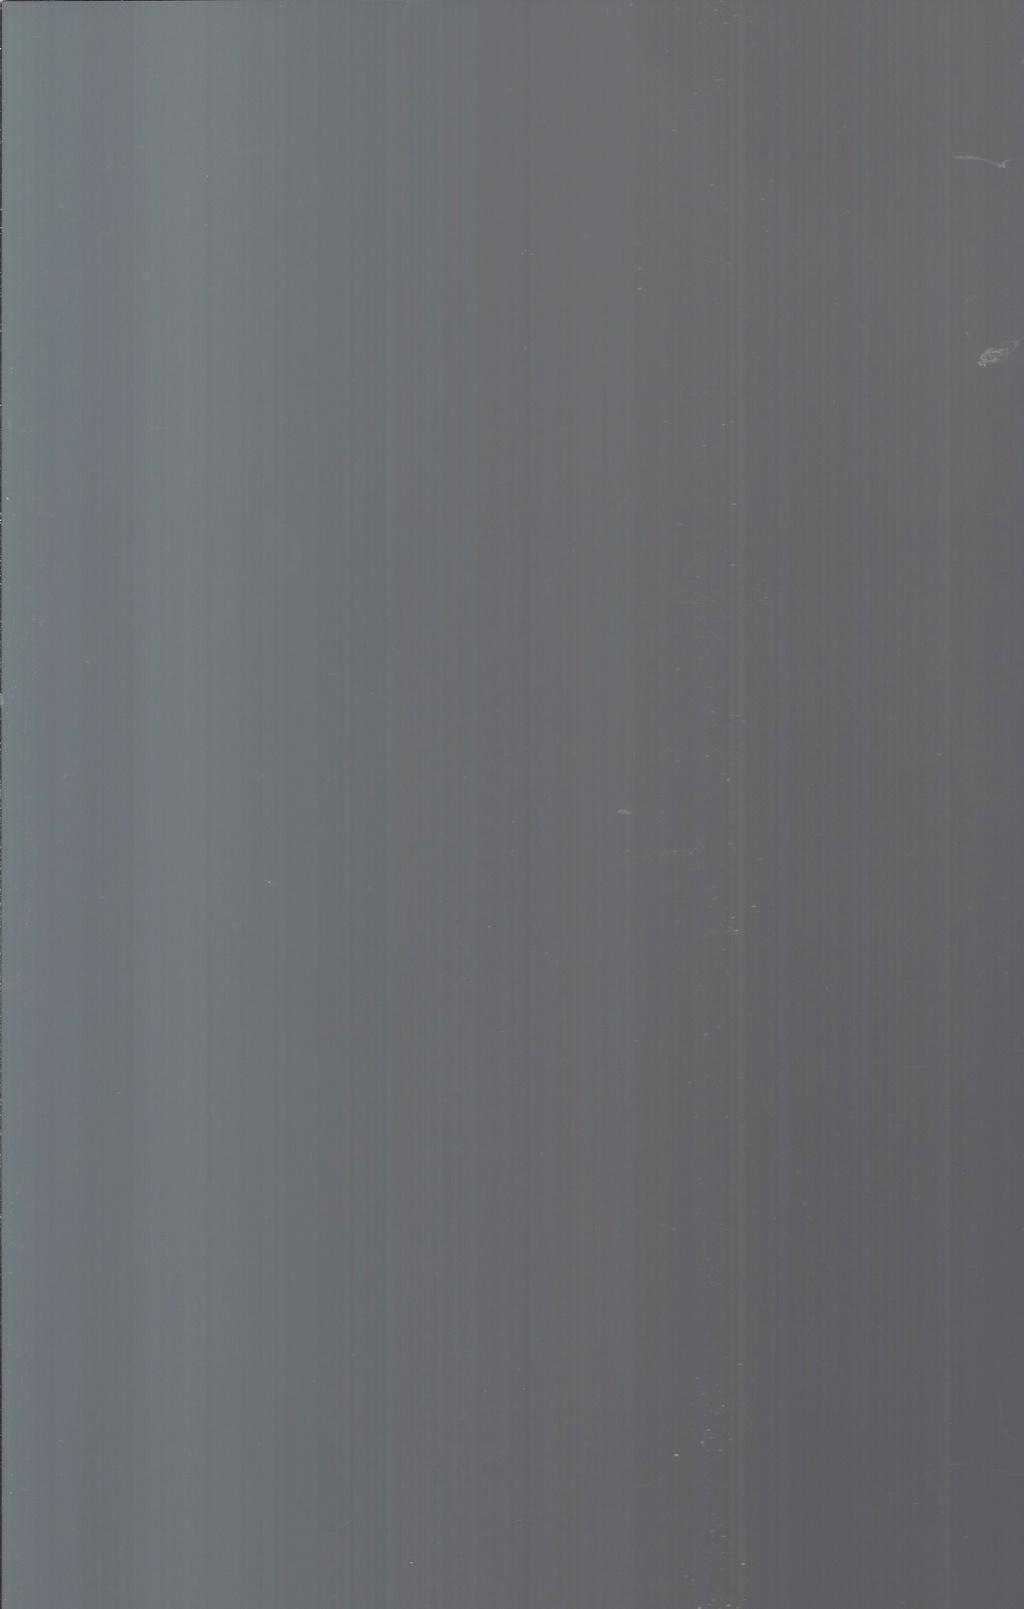 [AIRFIX 2013] Catalogue 2013 Airf1484